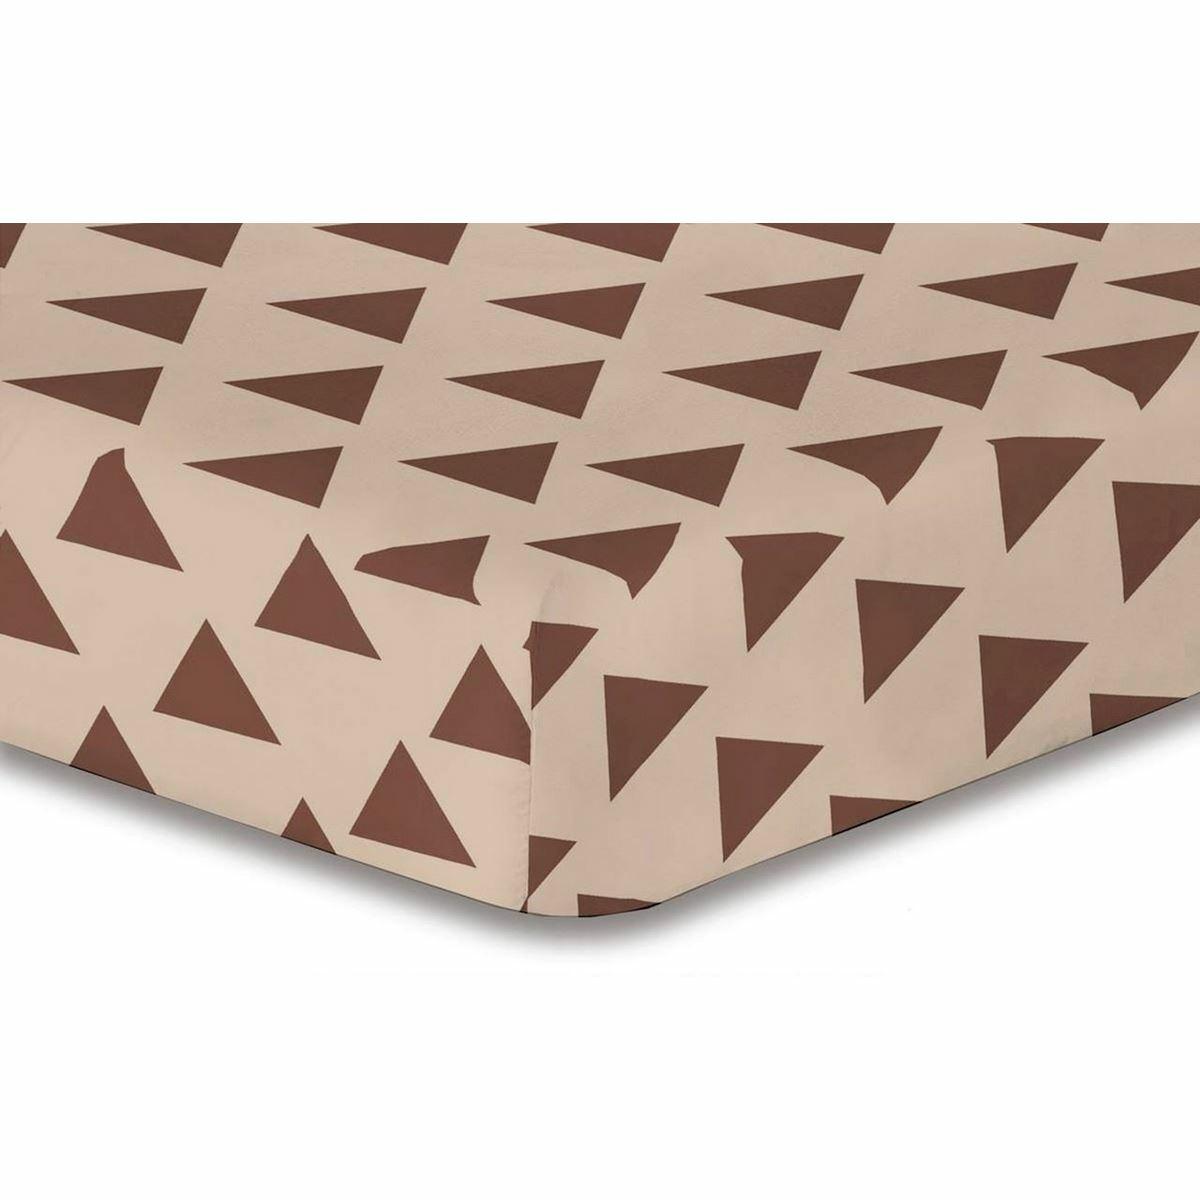 DecoKing Prostěradlo Triangles hnědá S1, 90 x 200 cm